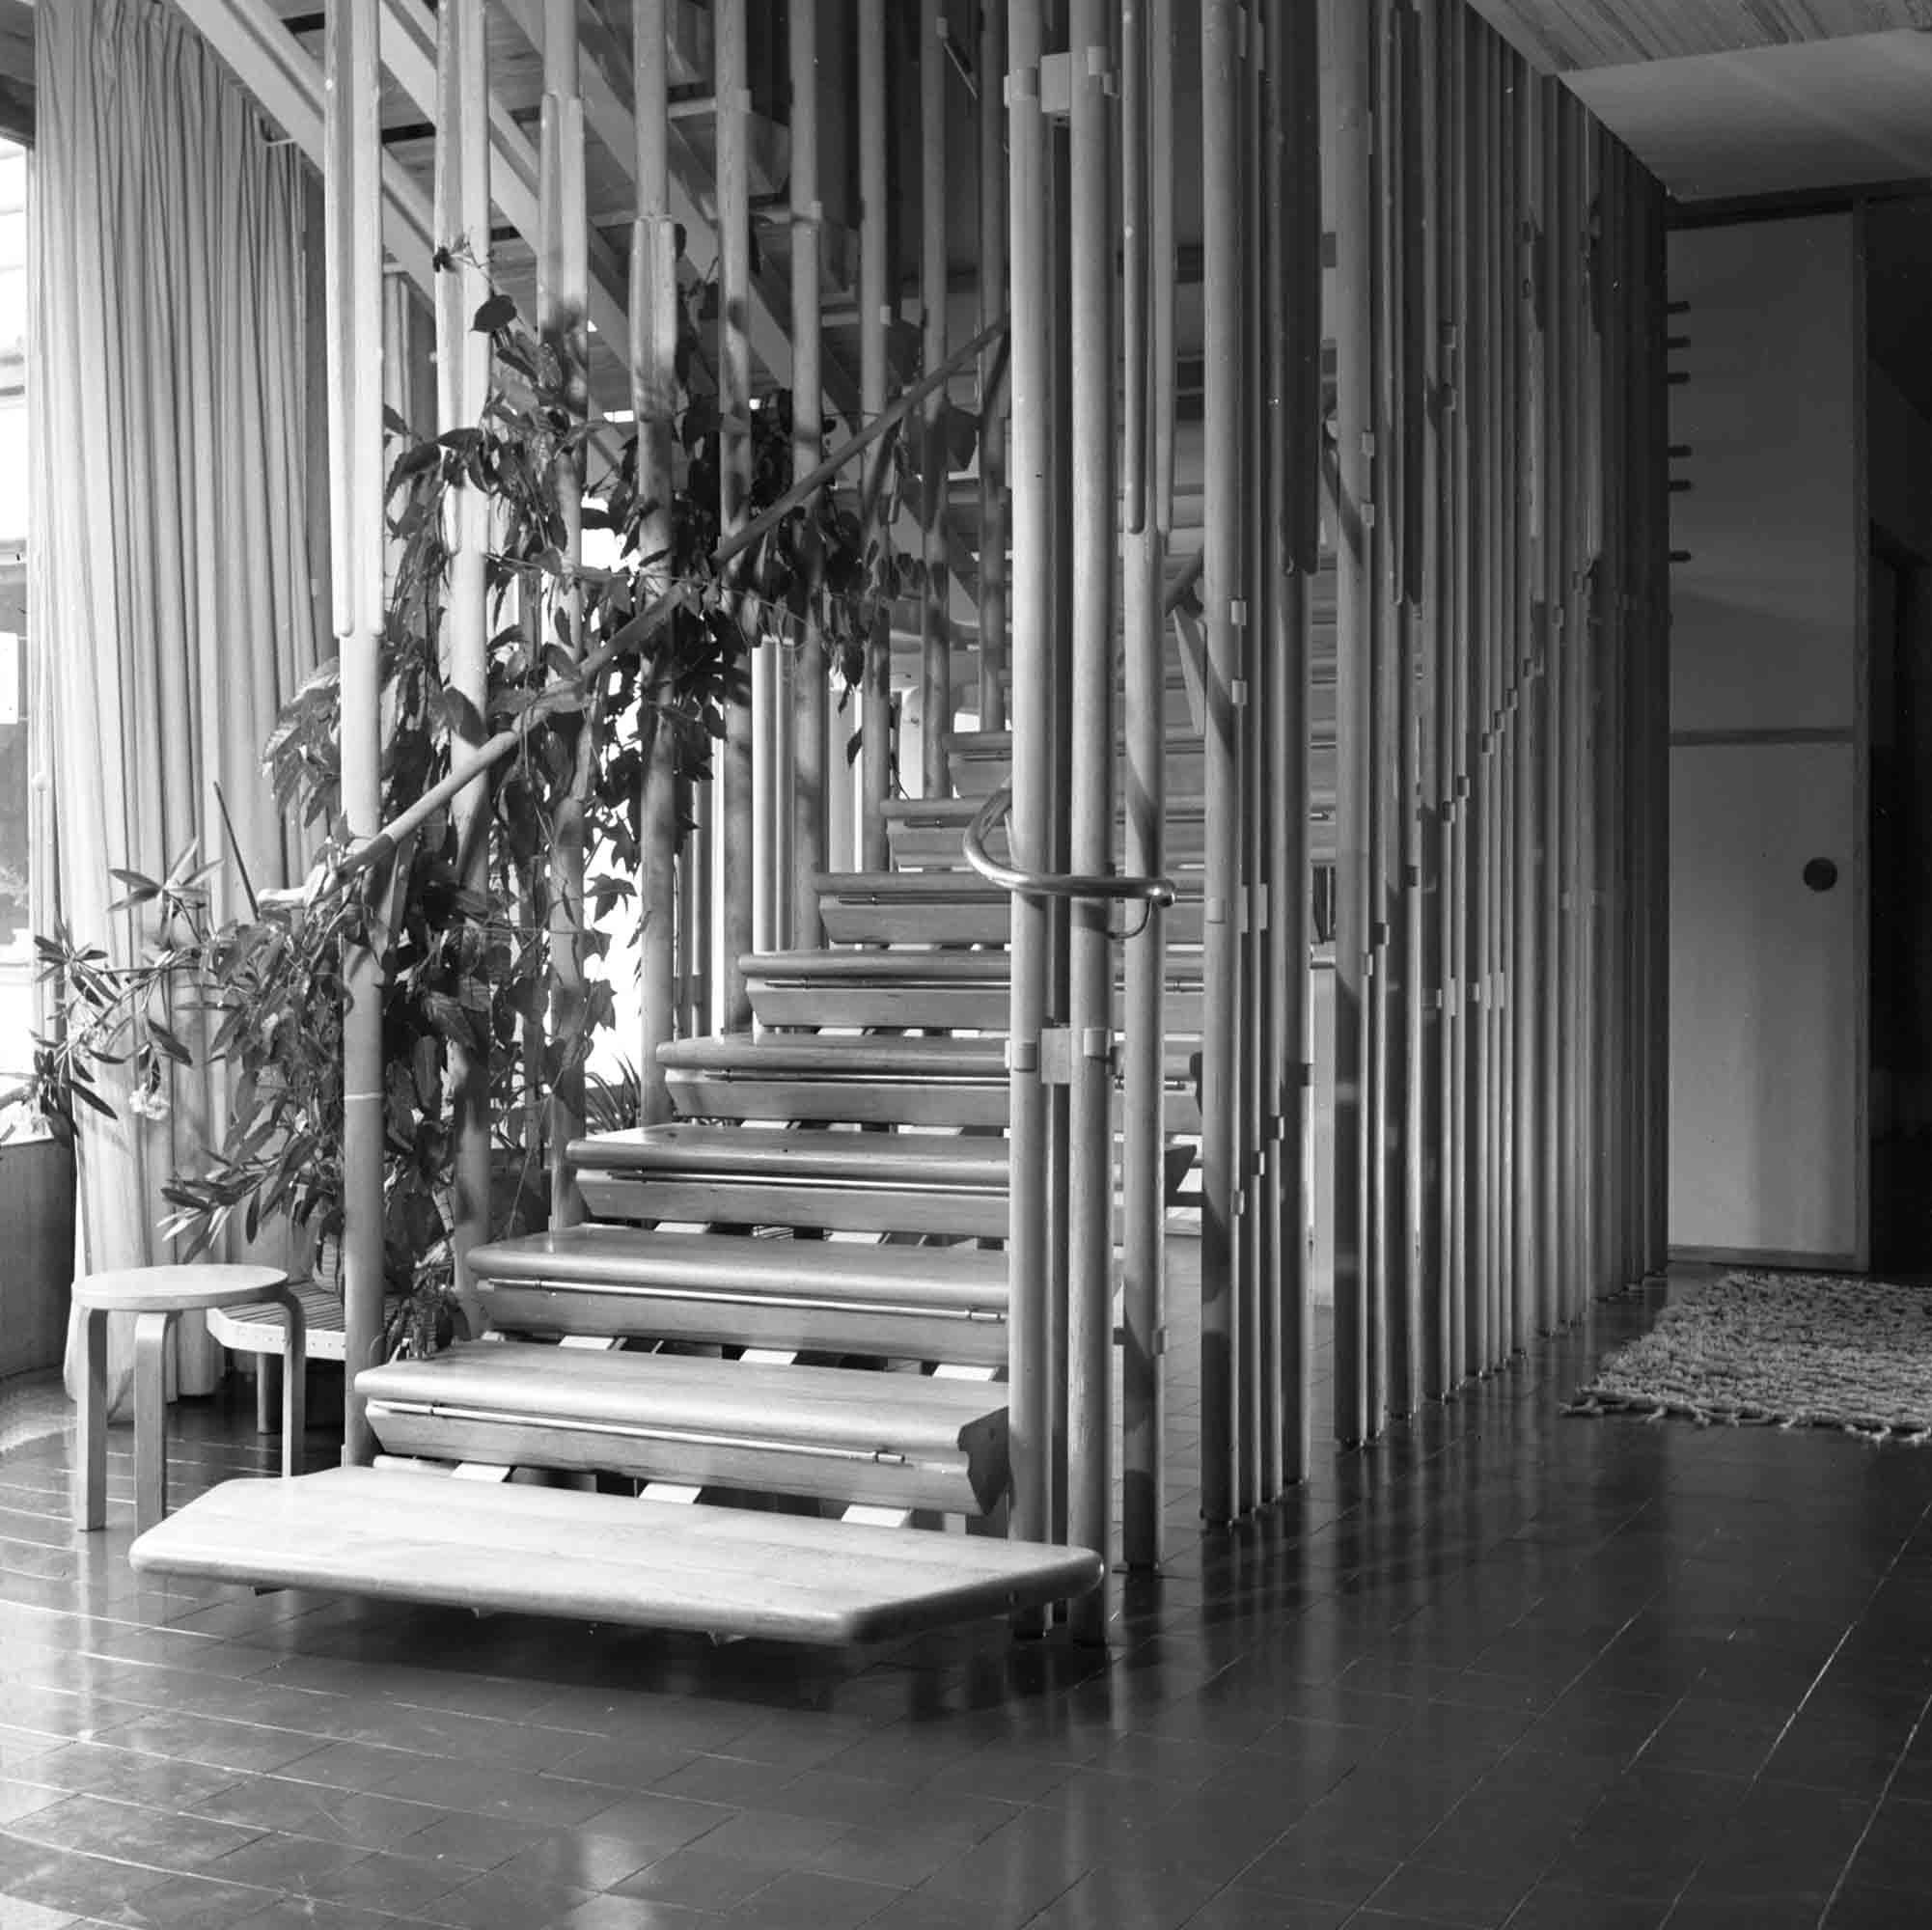 Villa Mairea ©Alvar Aalto Museum